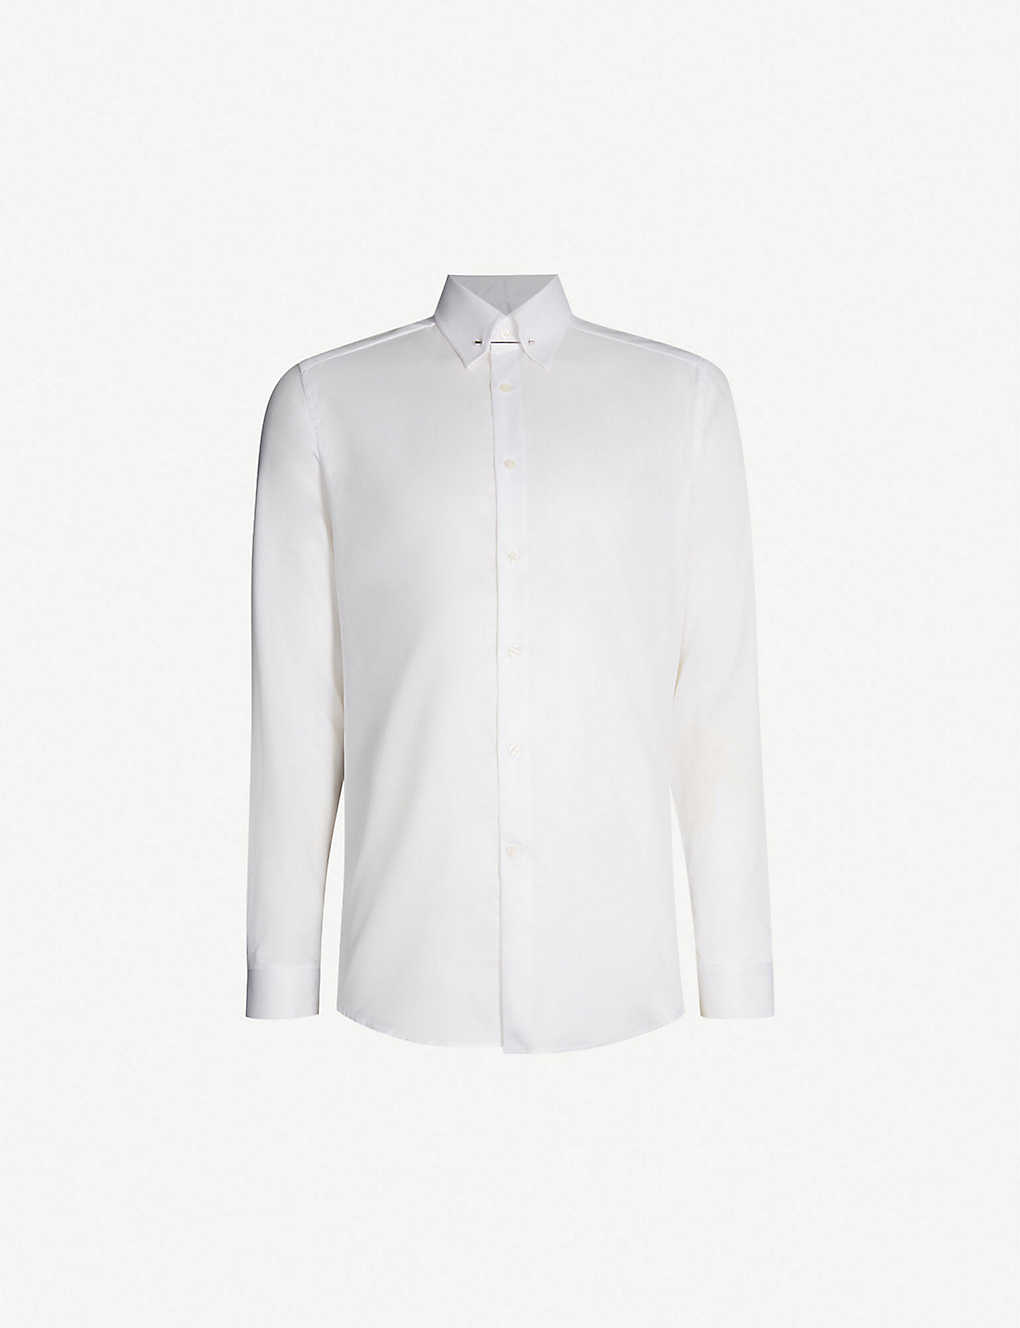 2047b798c921 REISS - Caldwell slim-fit cotton-twill collar bar shirt | Selfridges.com